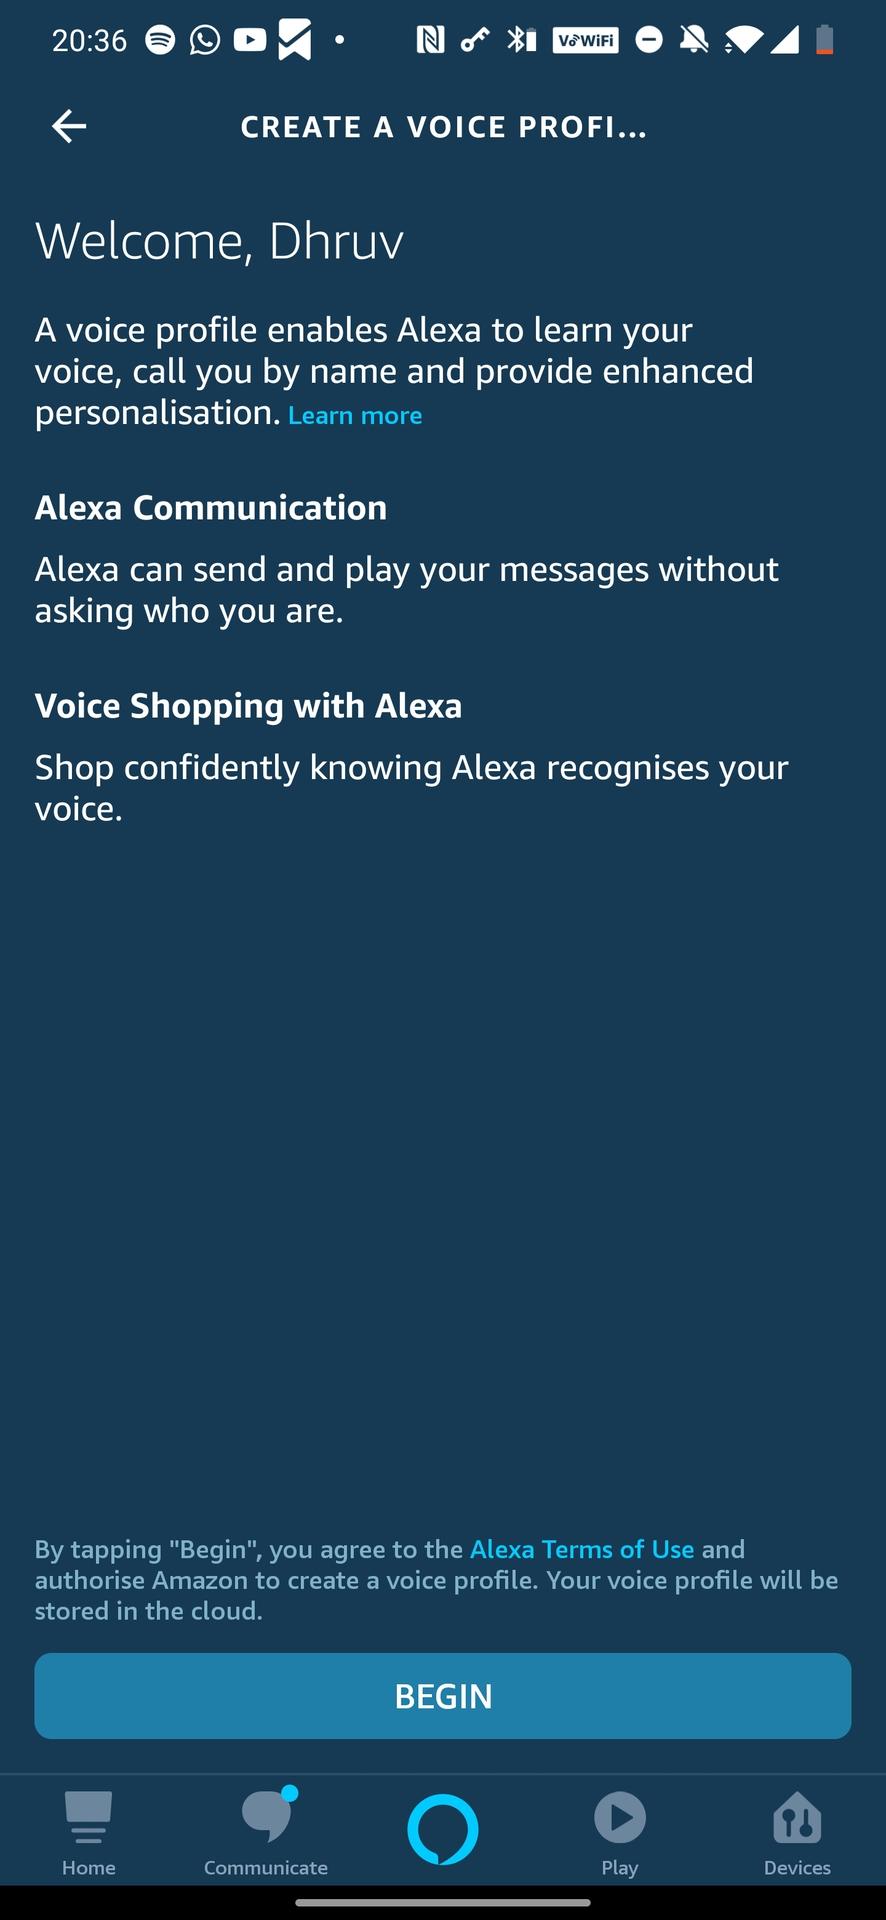 Create an Alexa Voice Profile